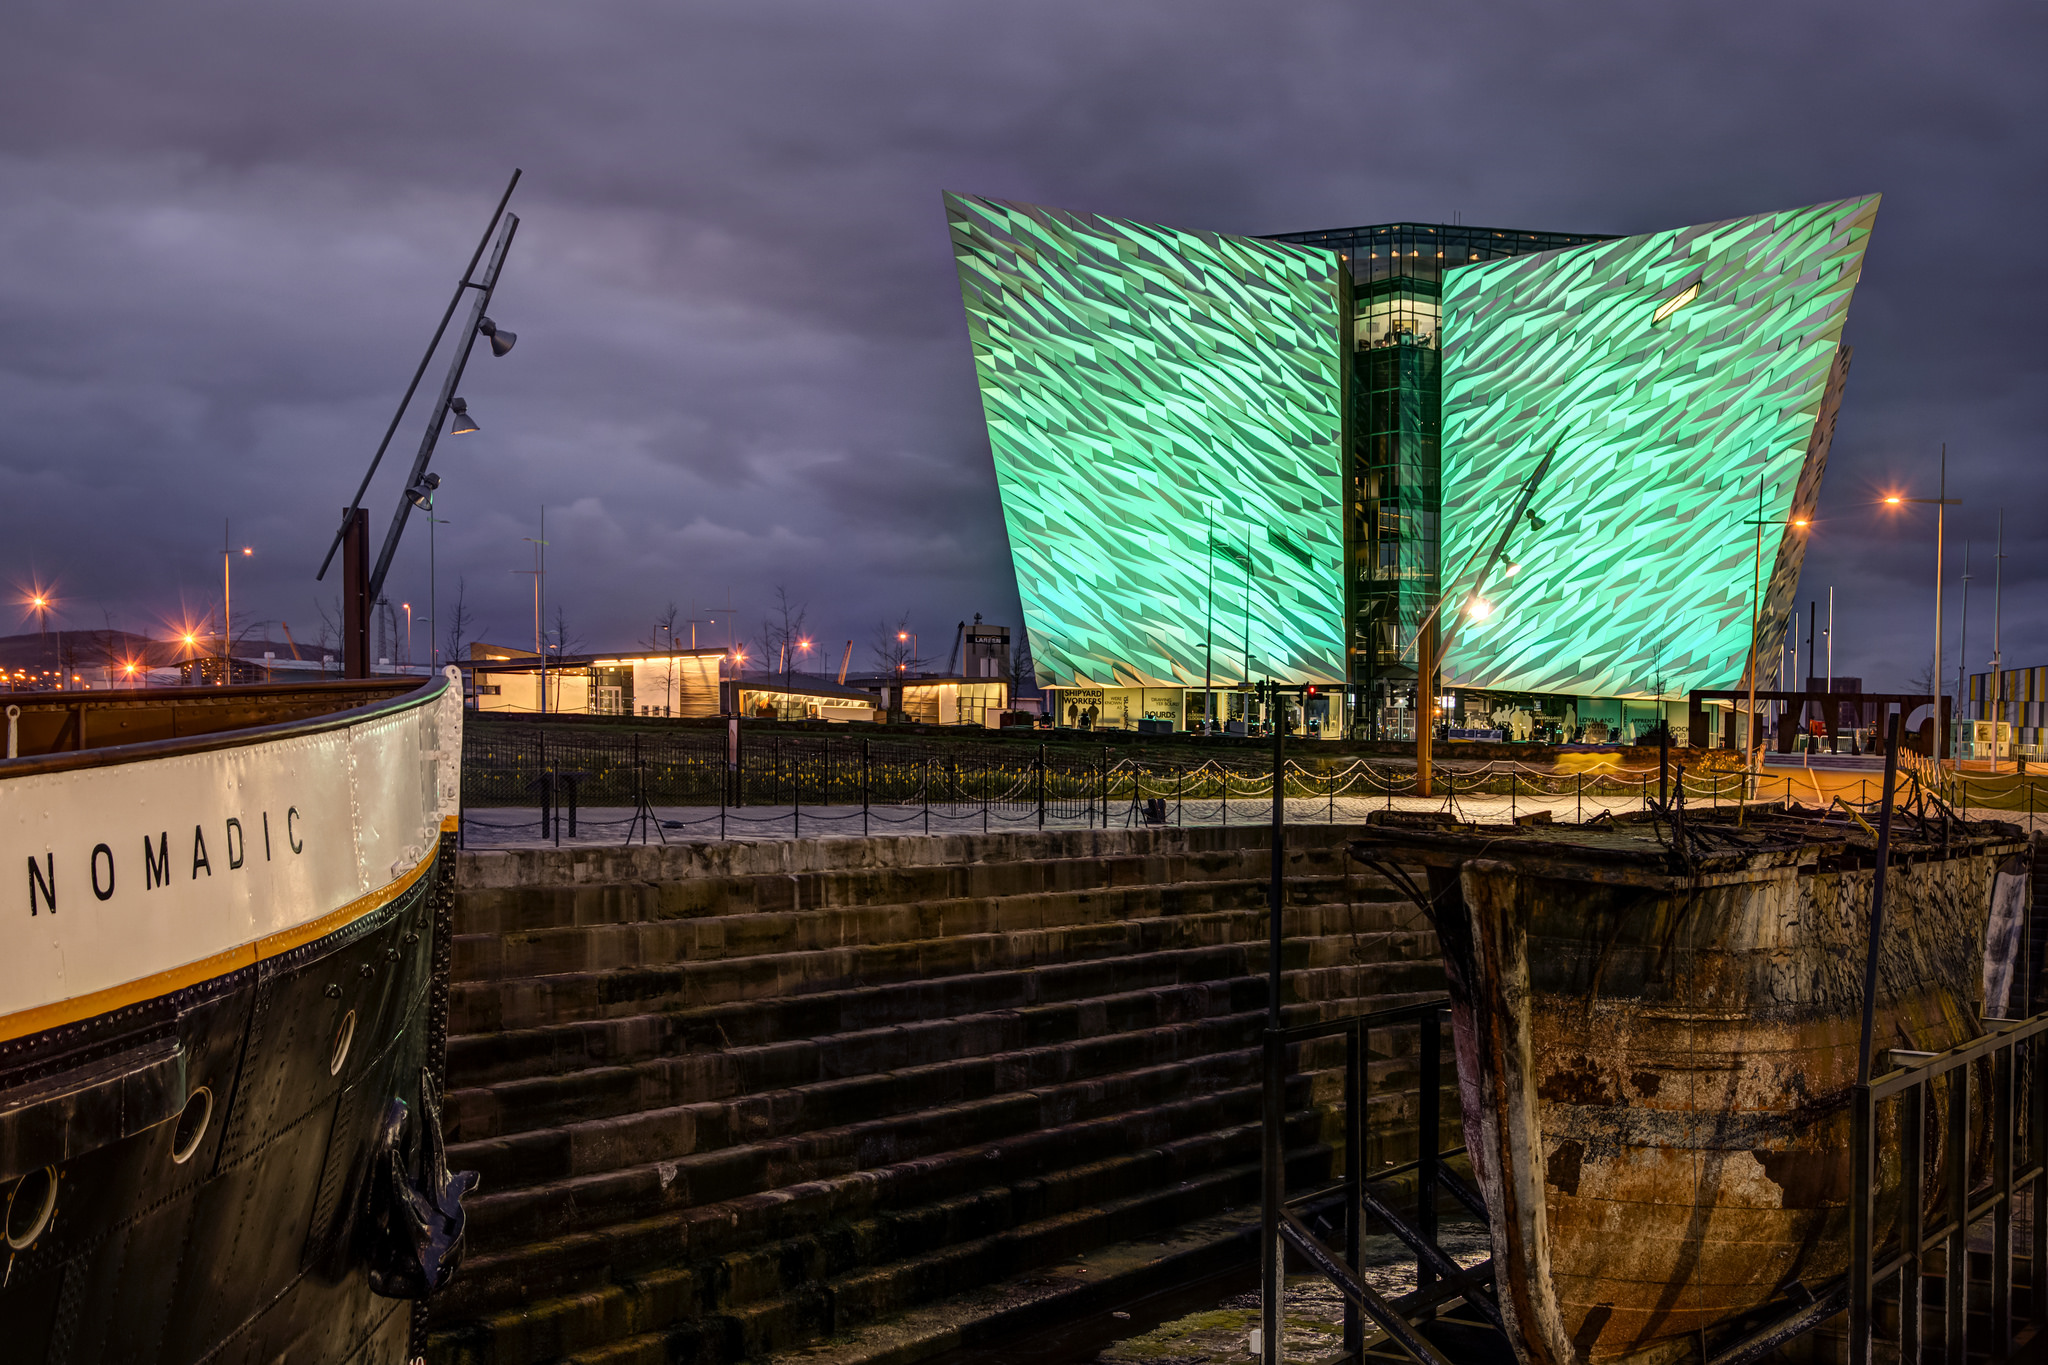 St. Patrick's Day at Belfast Docks | © Titanic Belfast/ Flickr